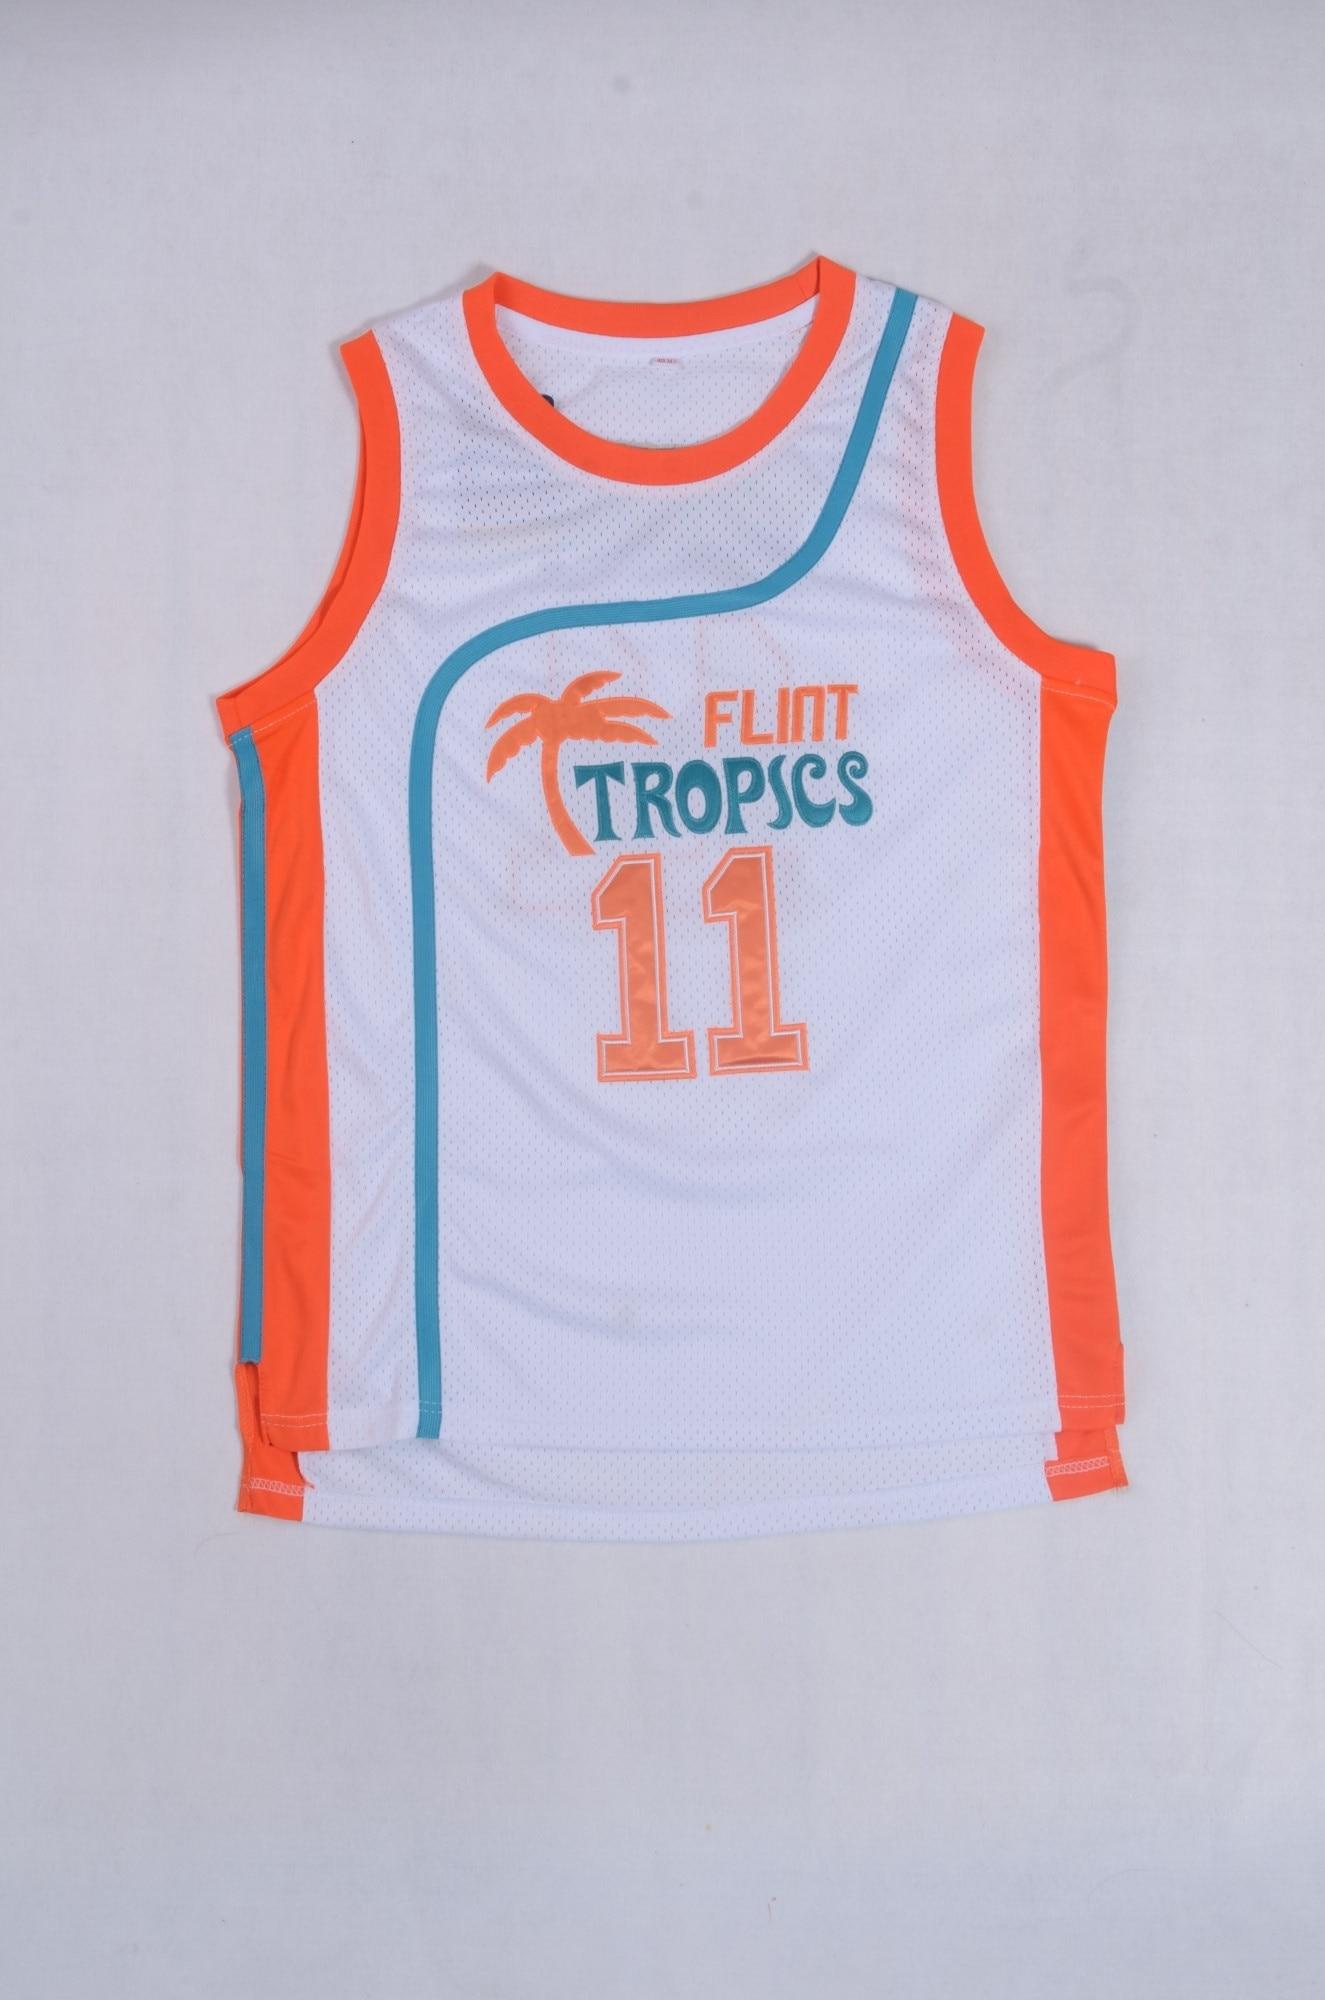 11 ED Monix Jersey Flint Tropics Semi Pro Movie Embroidered White Mens  Basketball Jersey-in Basketball Jerseys from Sports   Entertainment on ... 0efb03da6